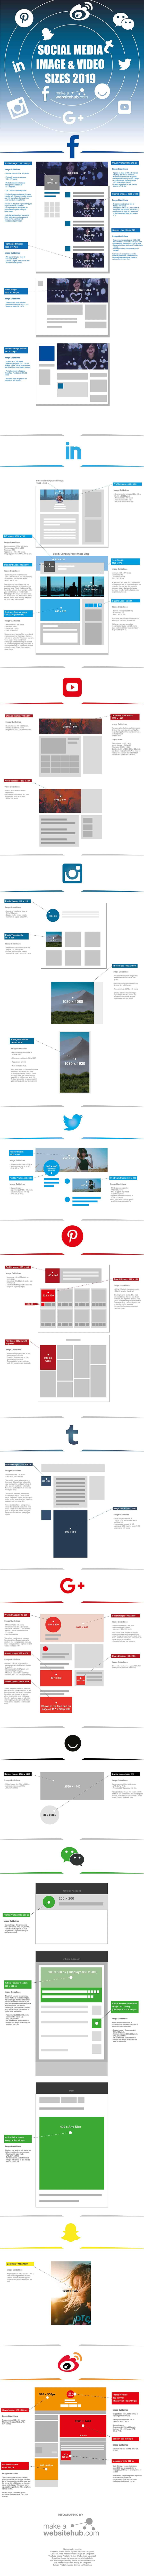 Guide: Social Media Optimization for 2019 [Infographic]